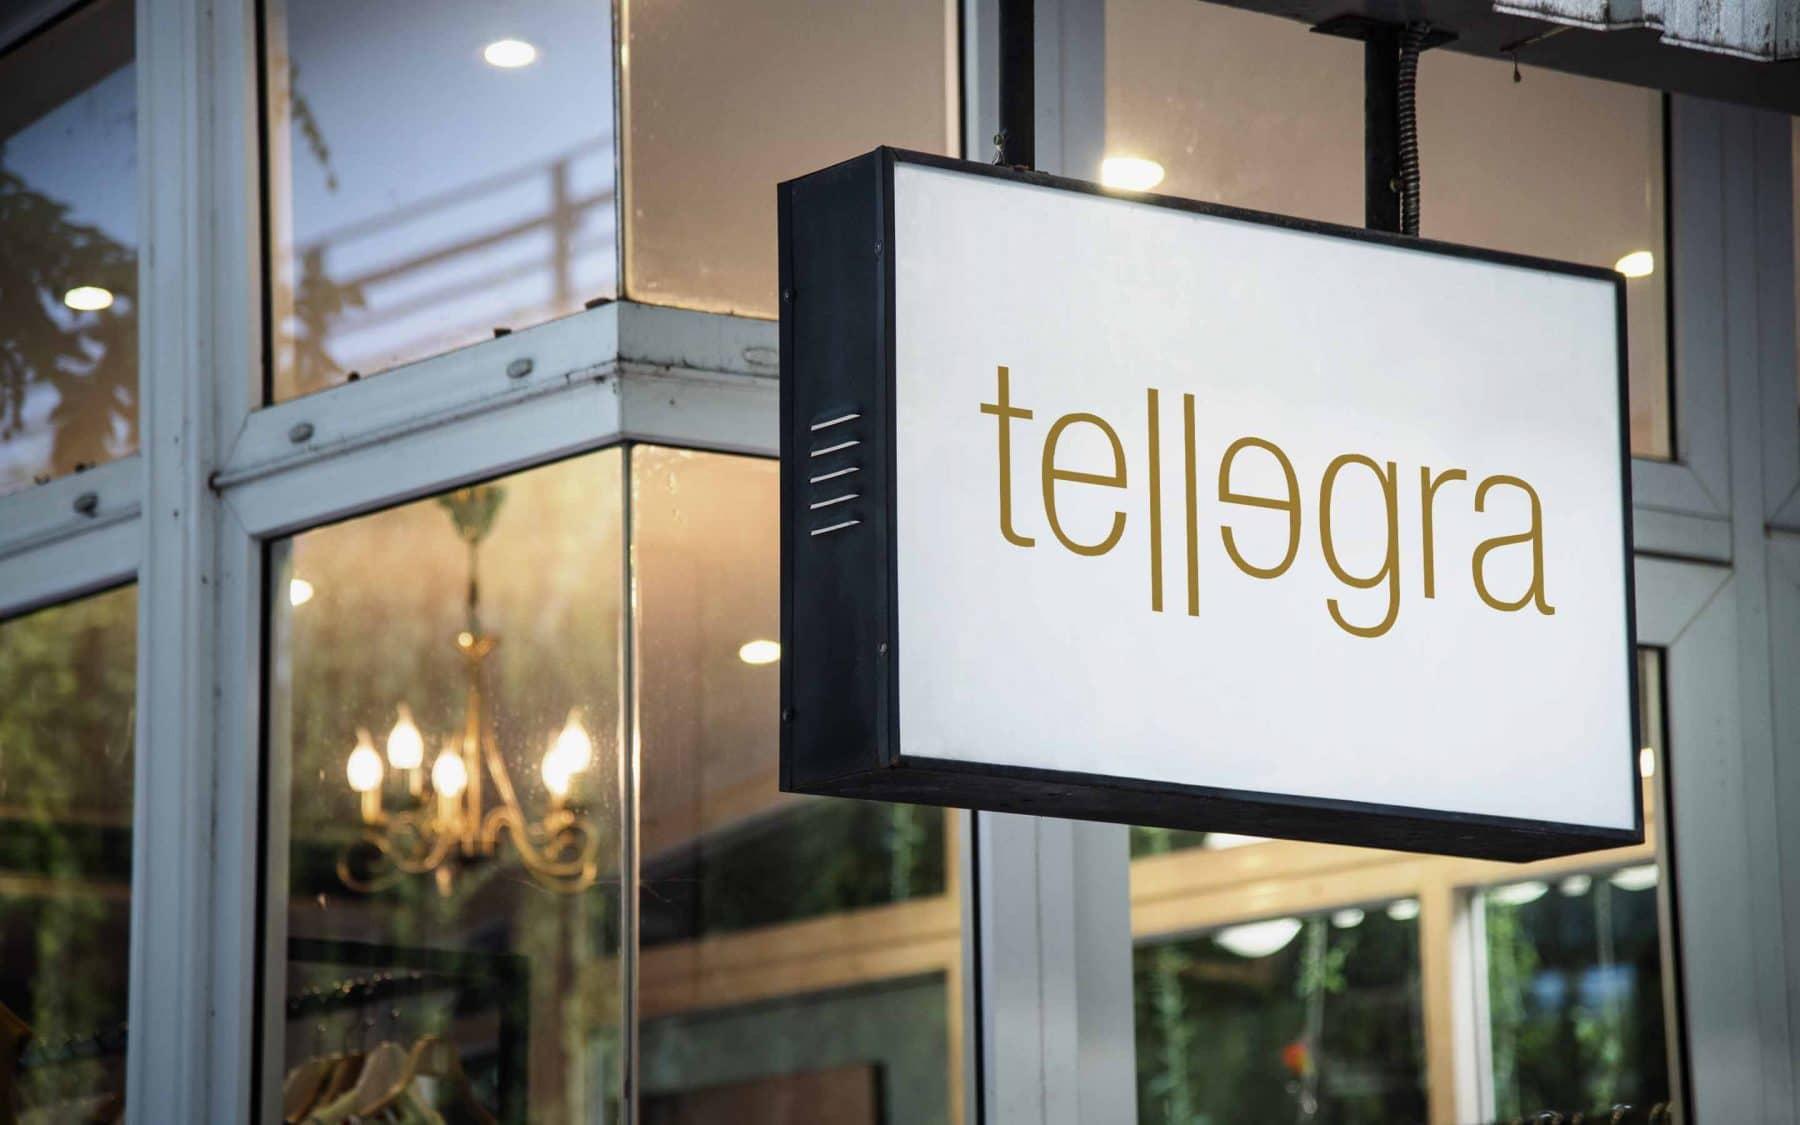 Tellegra 3